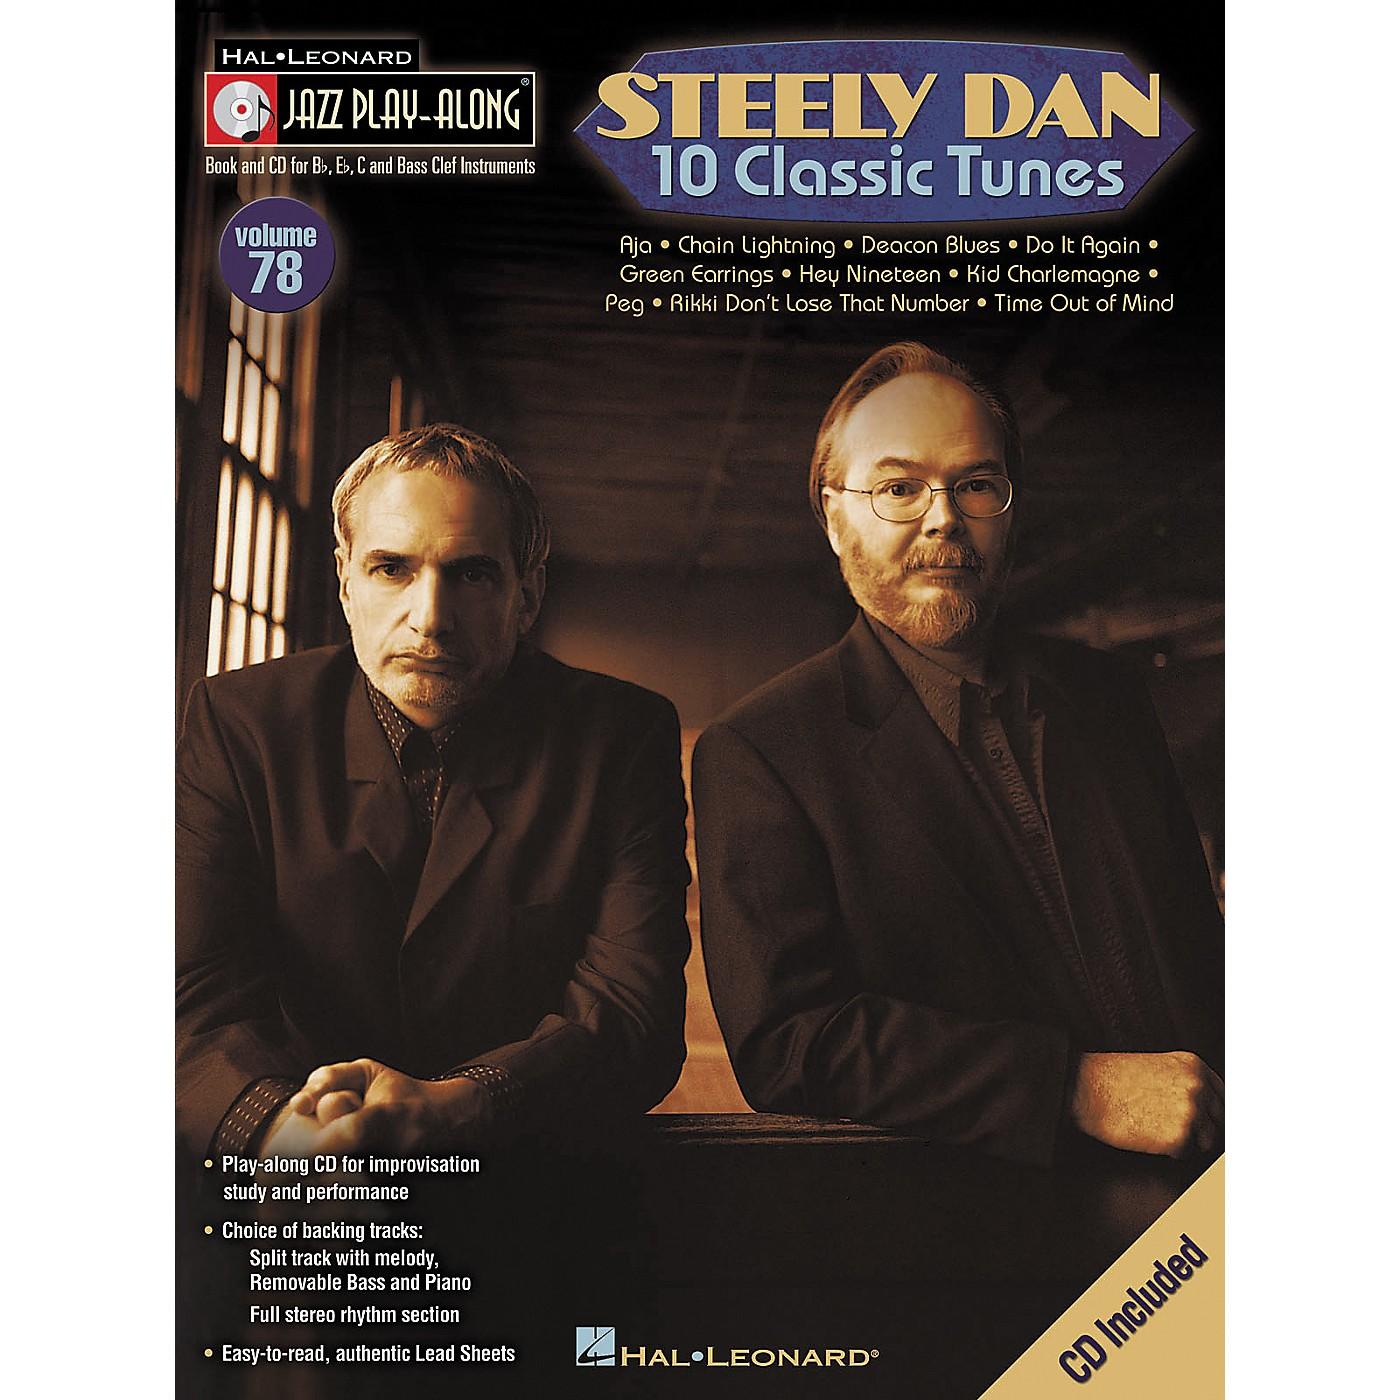 Hal Leonard Steely Dan 10 Classic Tunes - Jazz Play-Along, Volume 78 (CD/Booklet) thumbnail